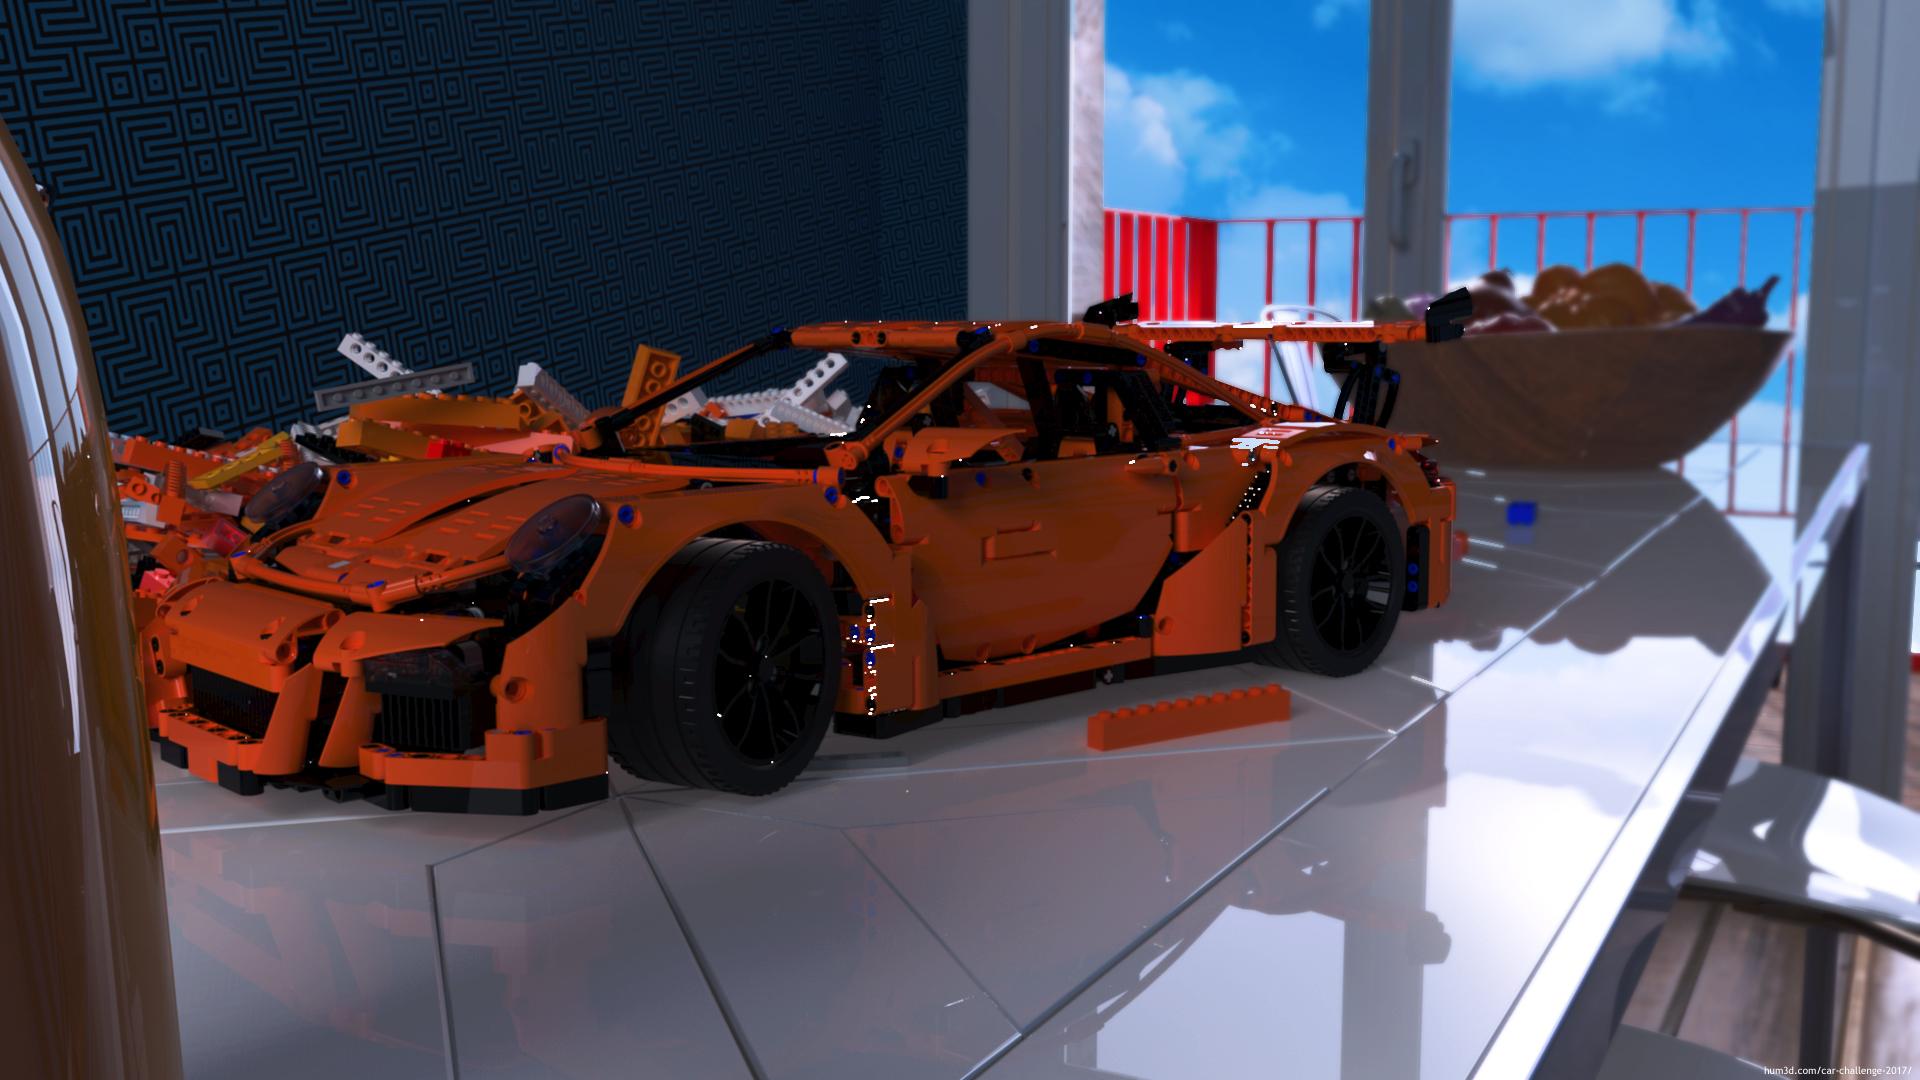 Porsche 911 GT3 RS Lego Race Car